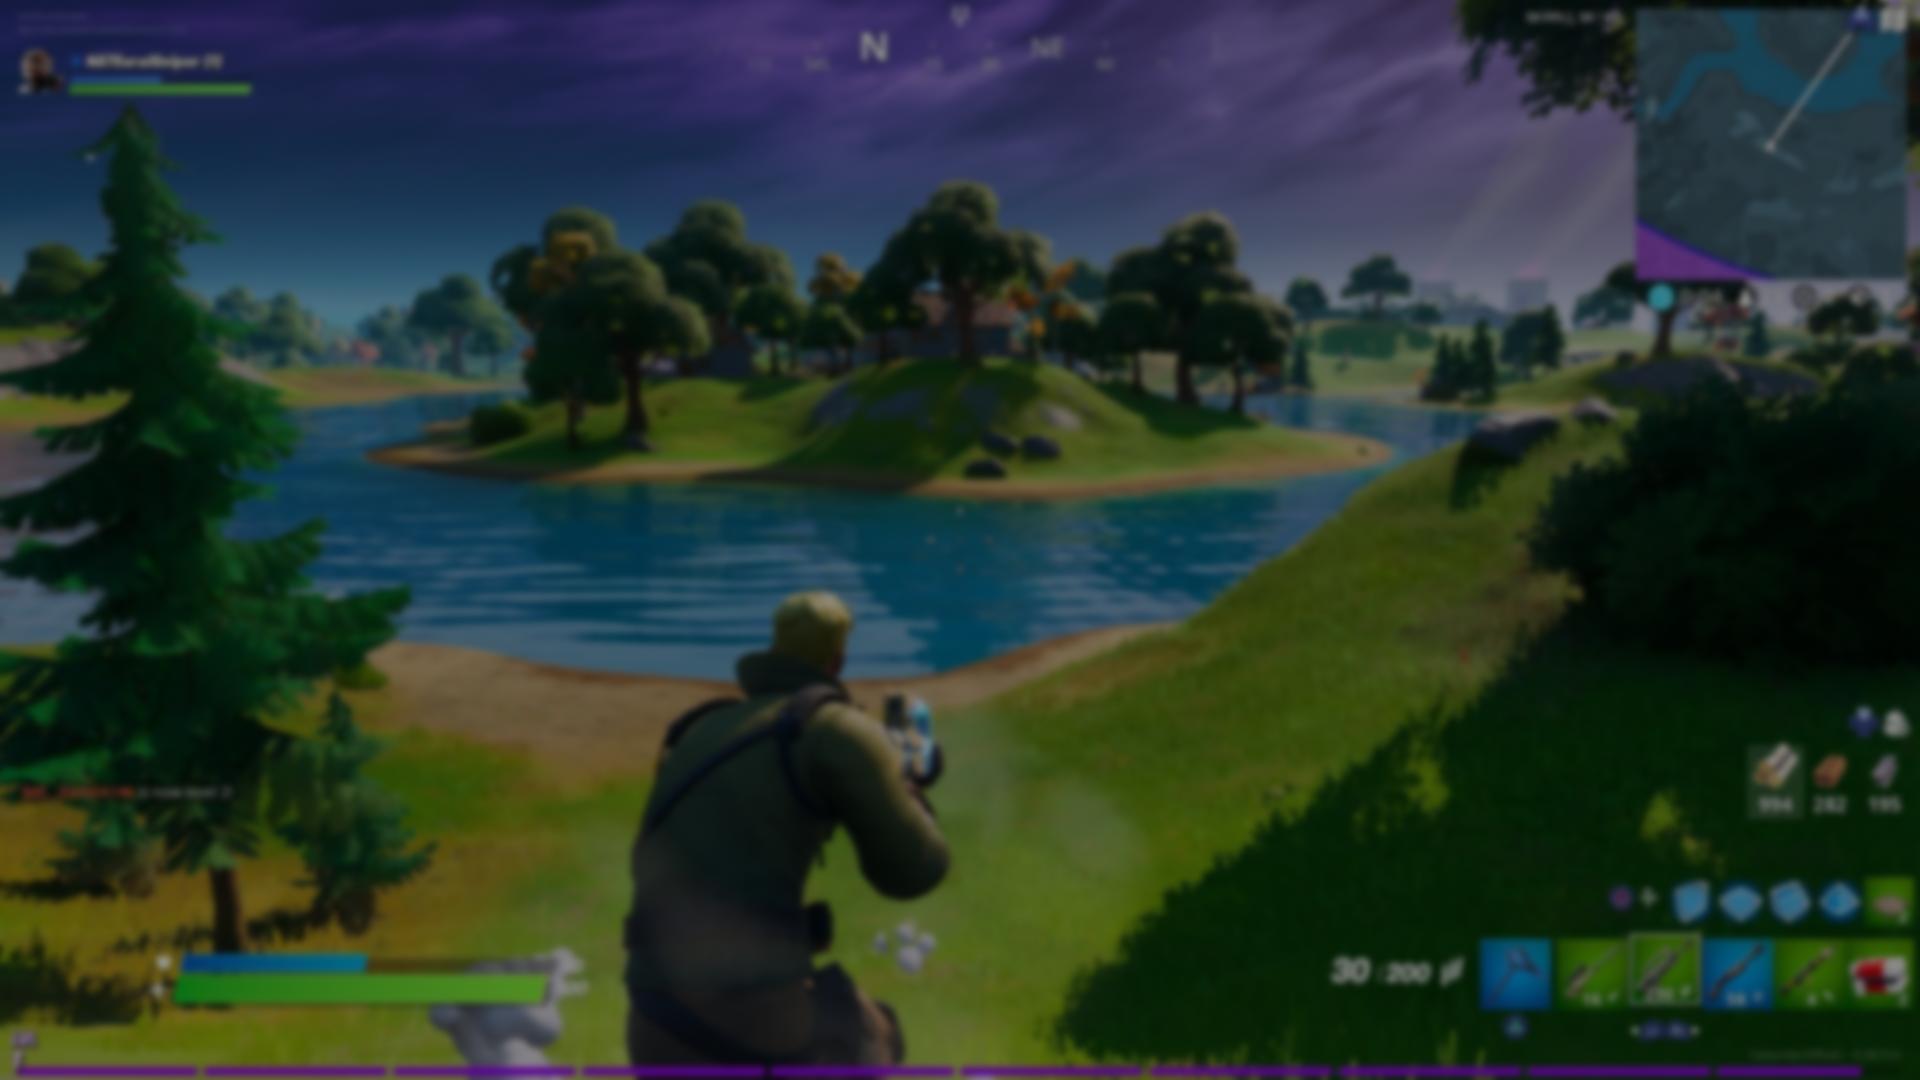 Fortnite gameplay background